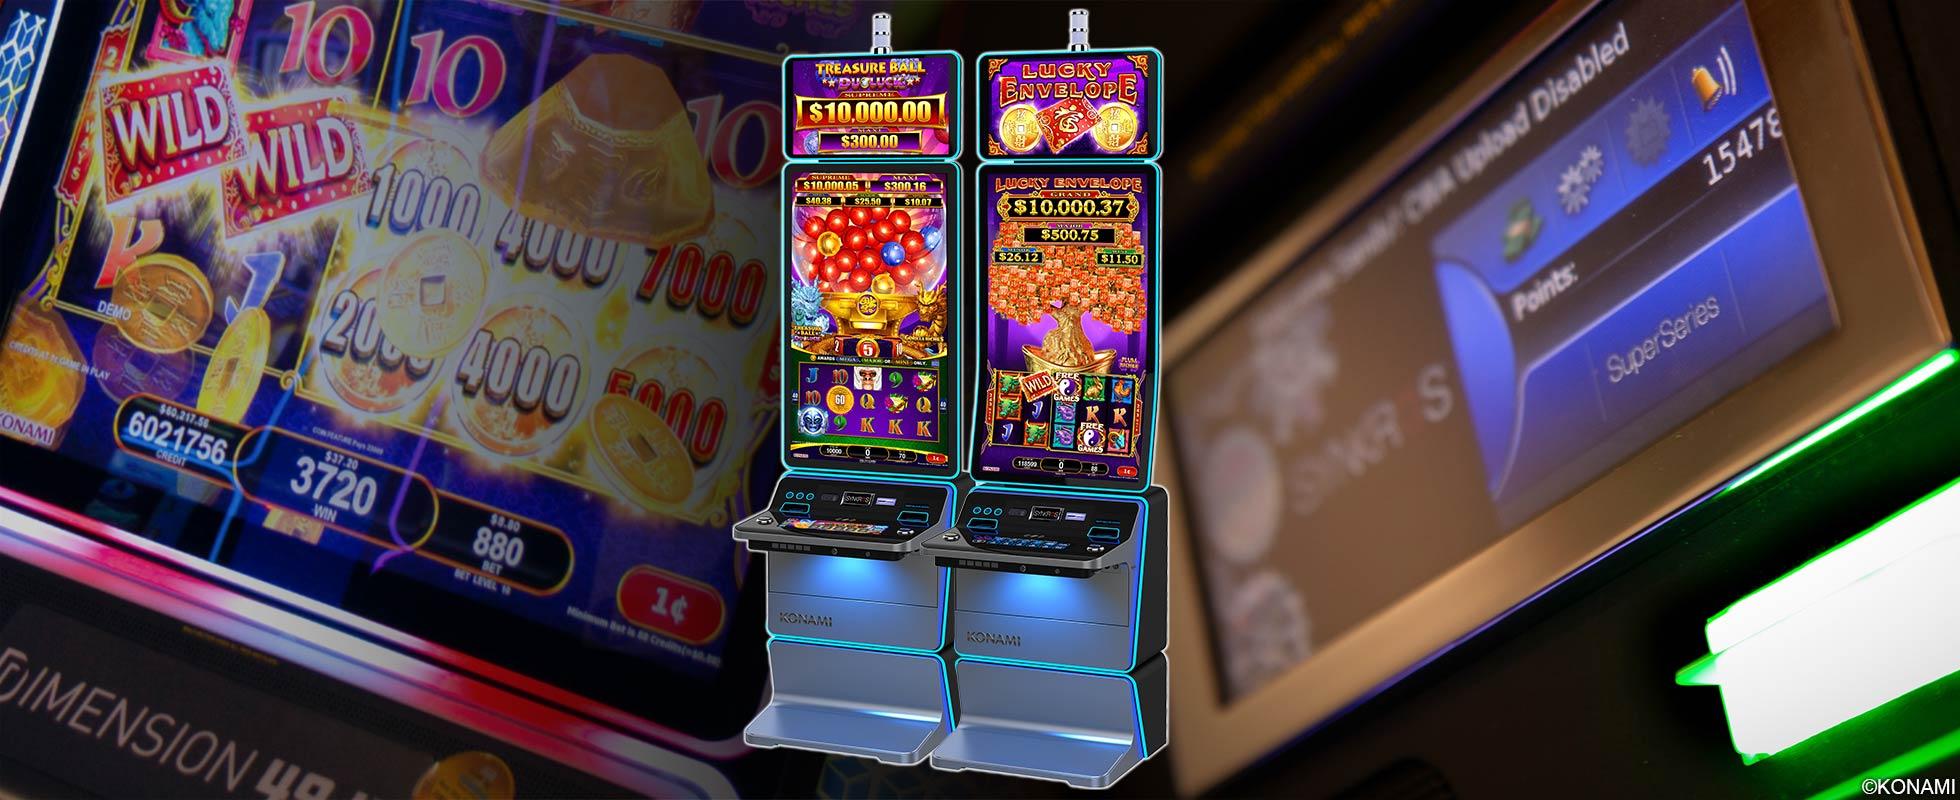 Konami casino restaurants in hollywood casino st louis